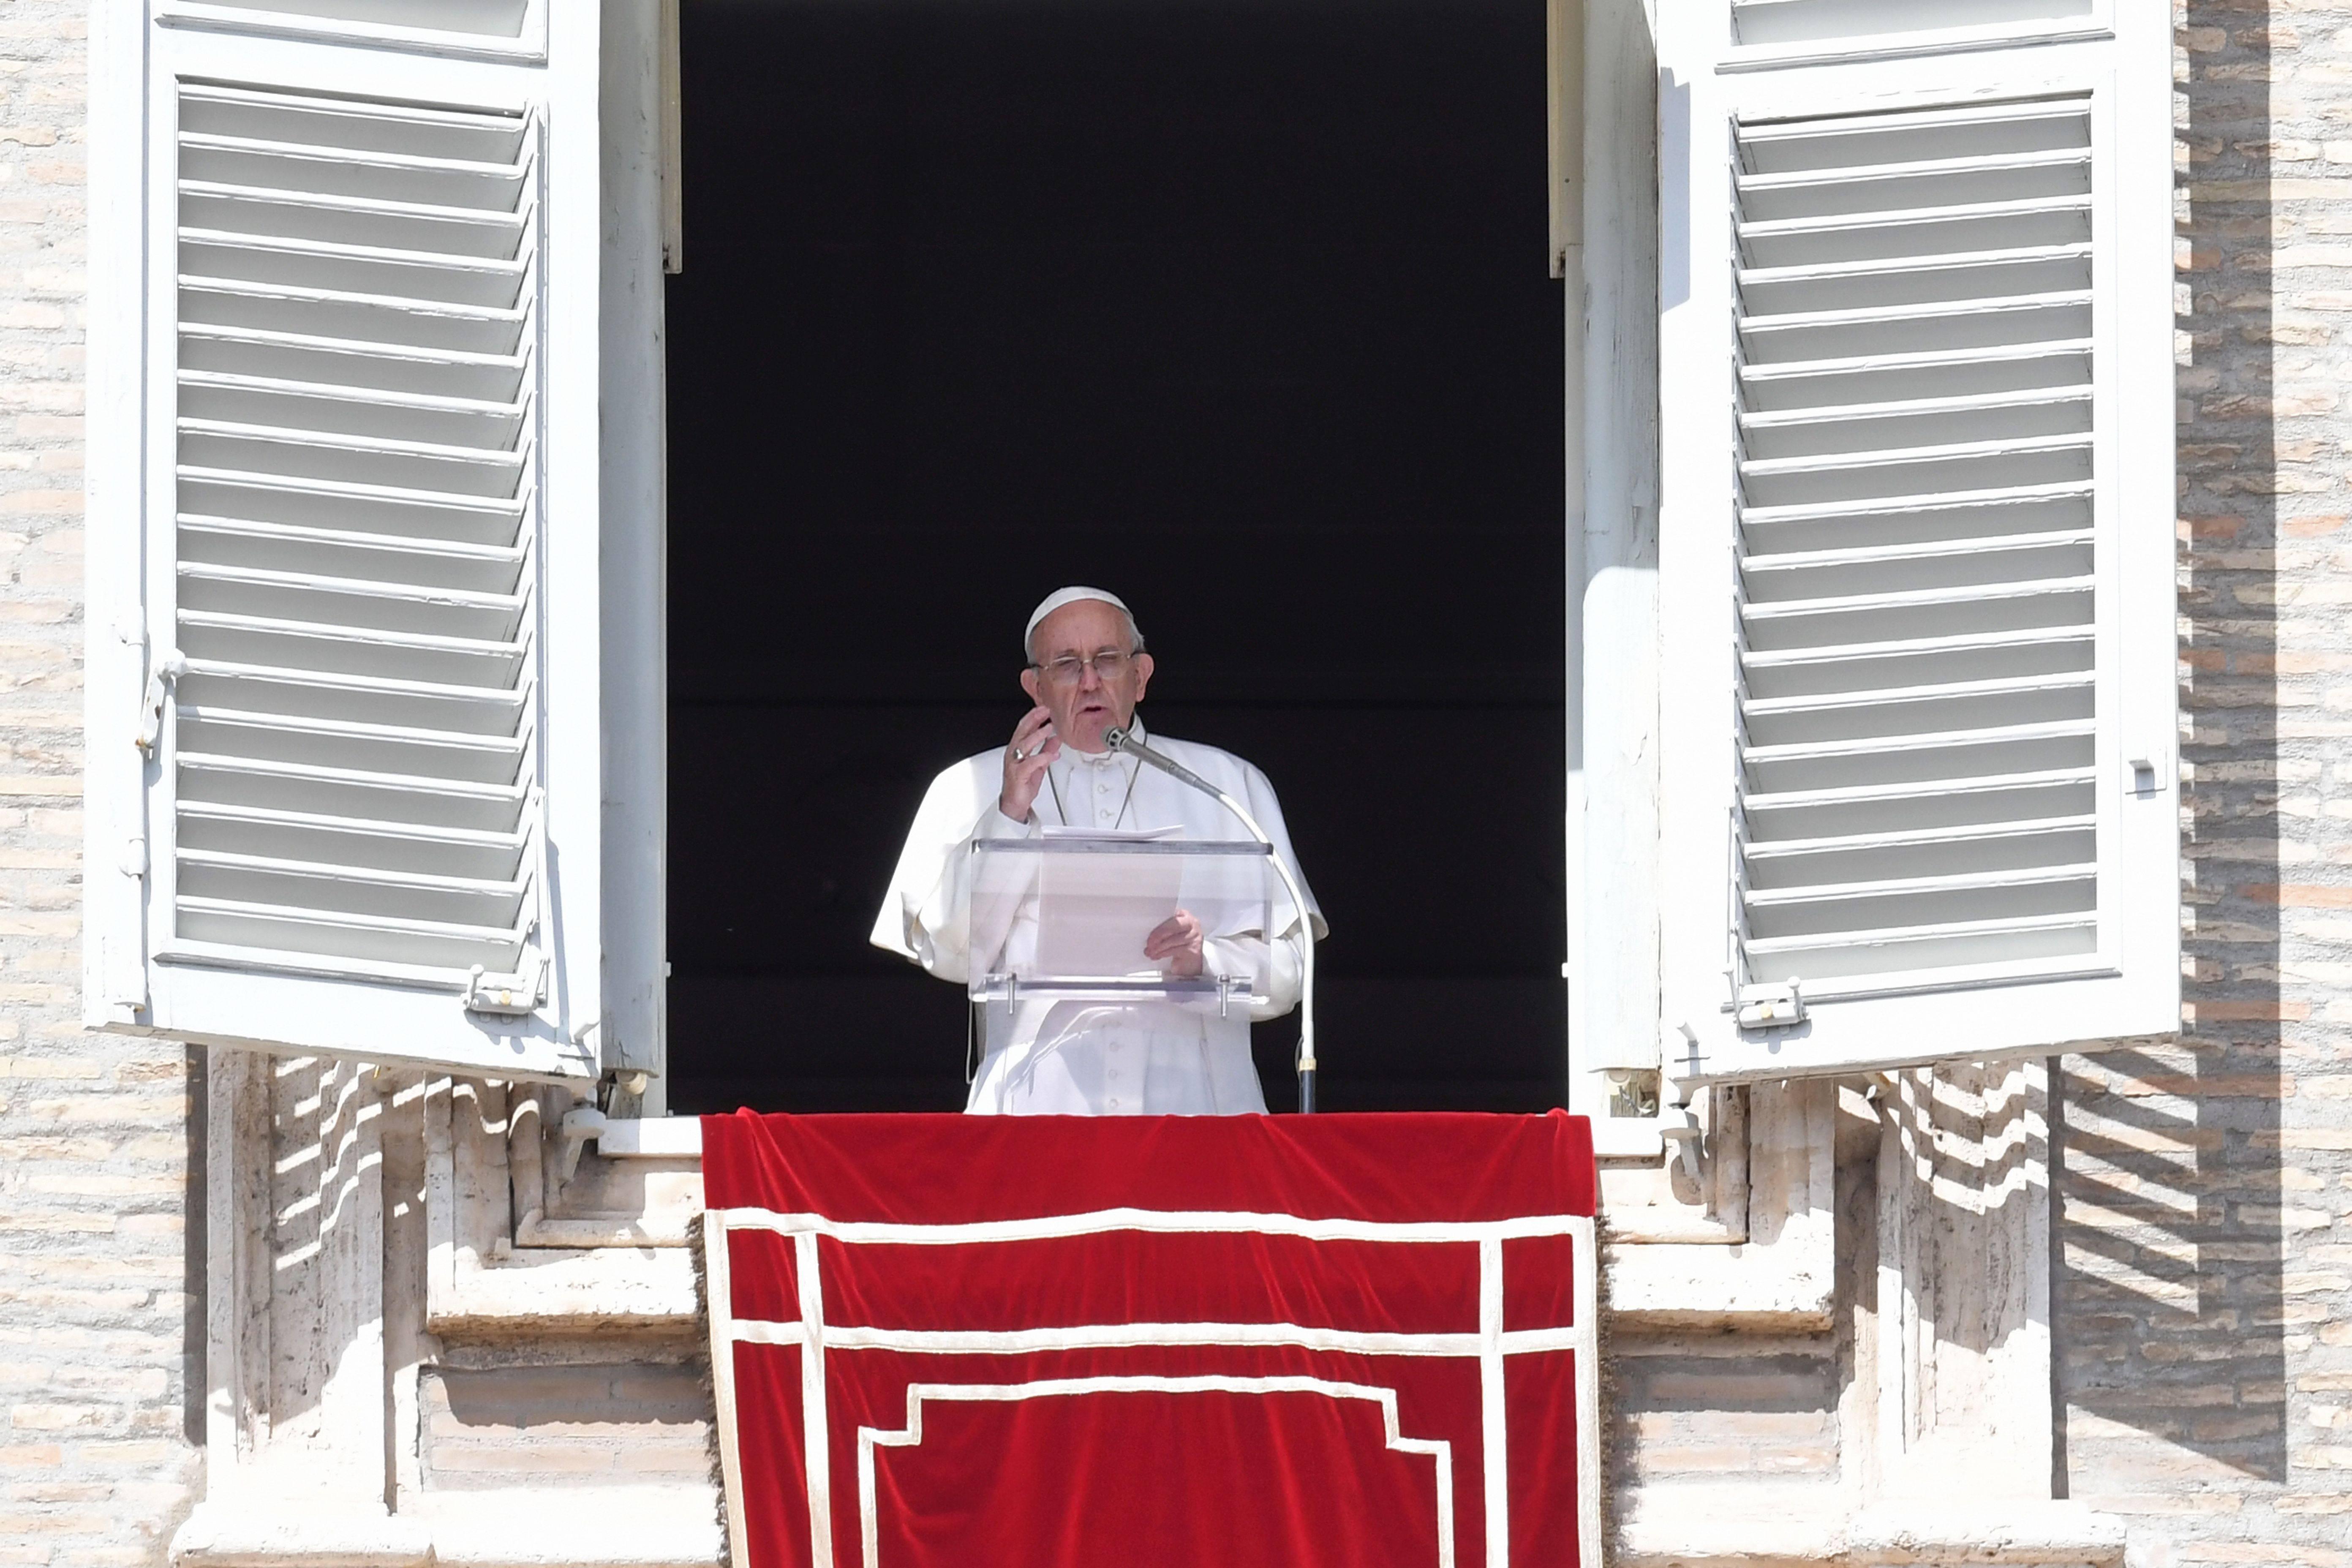 Papa Francesco: Vangelo, crocifisso e testimonianza di fede